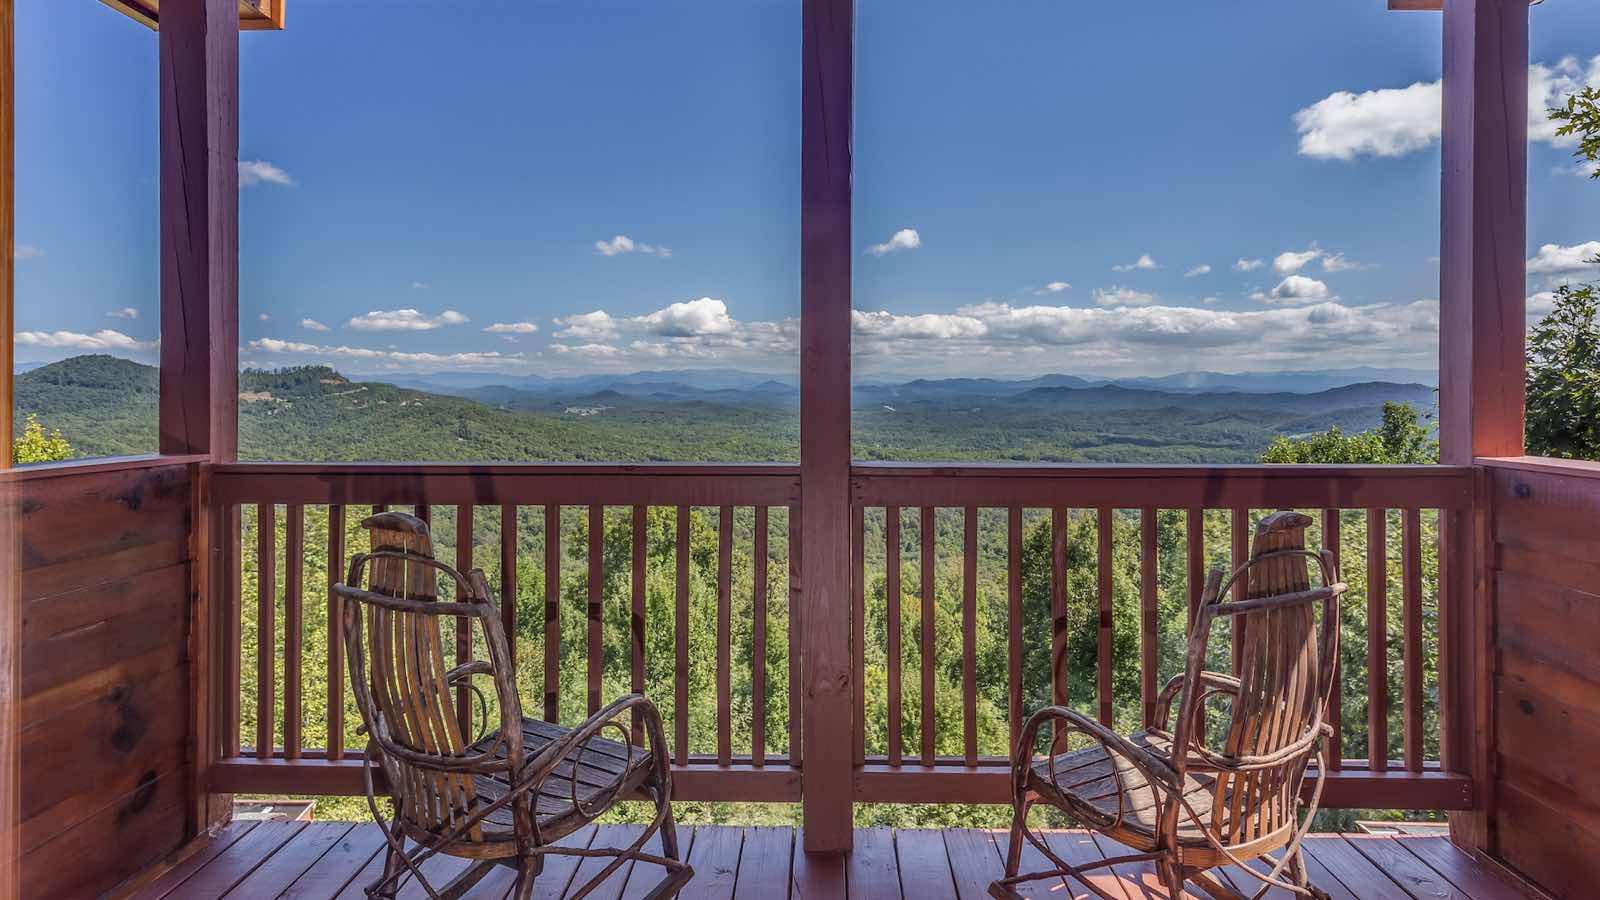 Downtown blue ridge ga lodging accommodations for Blue ridge ga cabins for rent